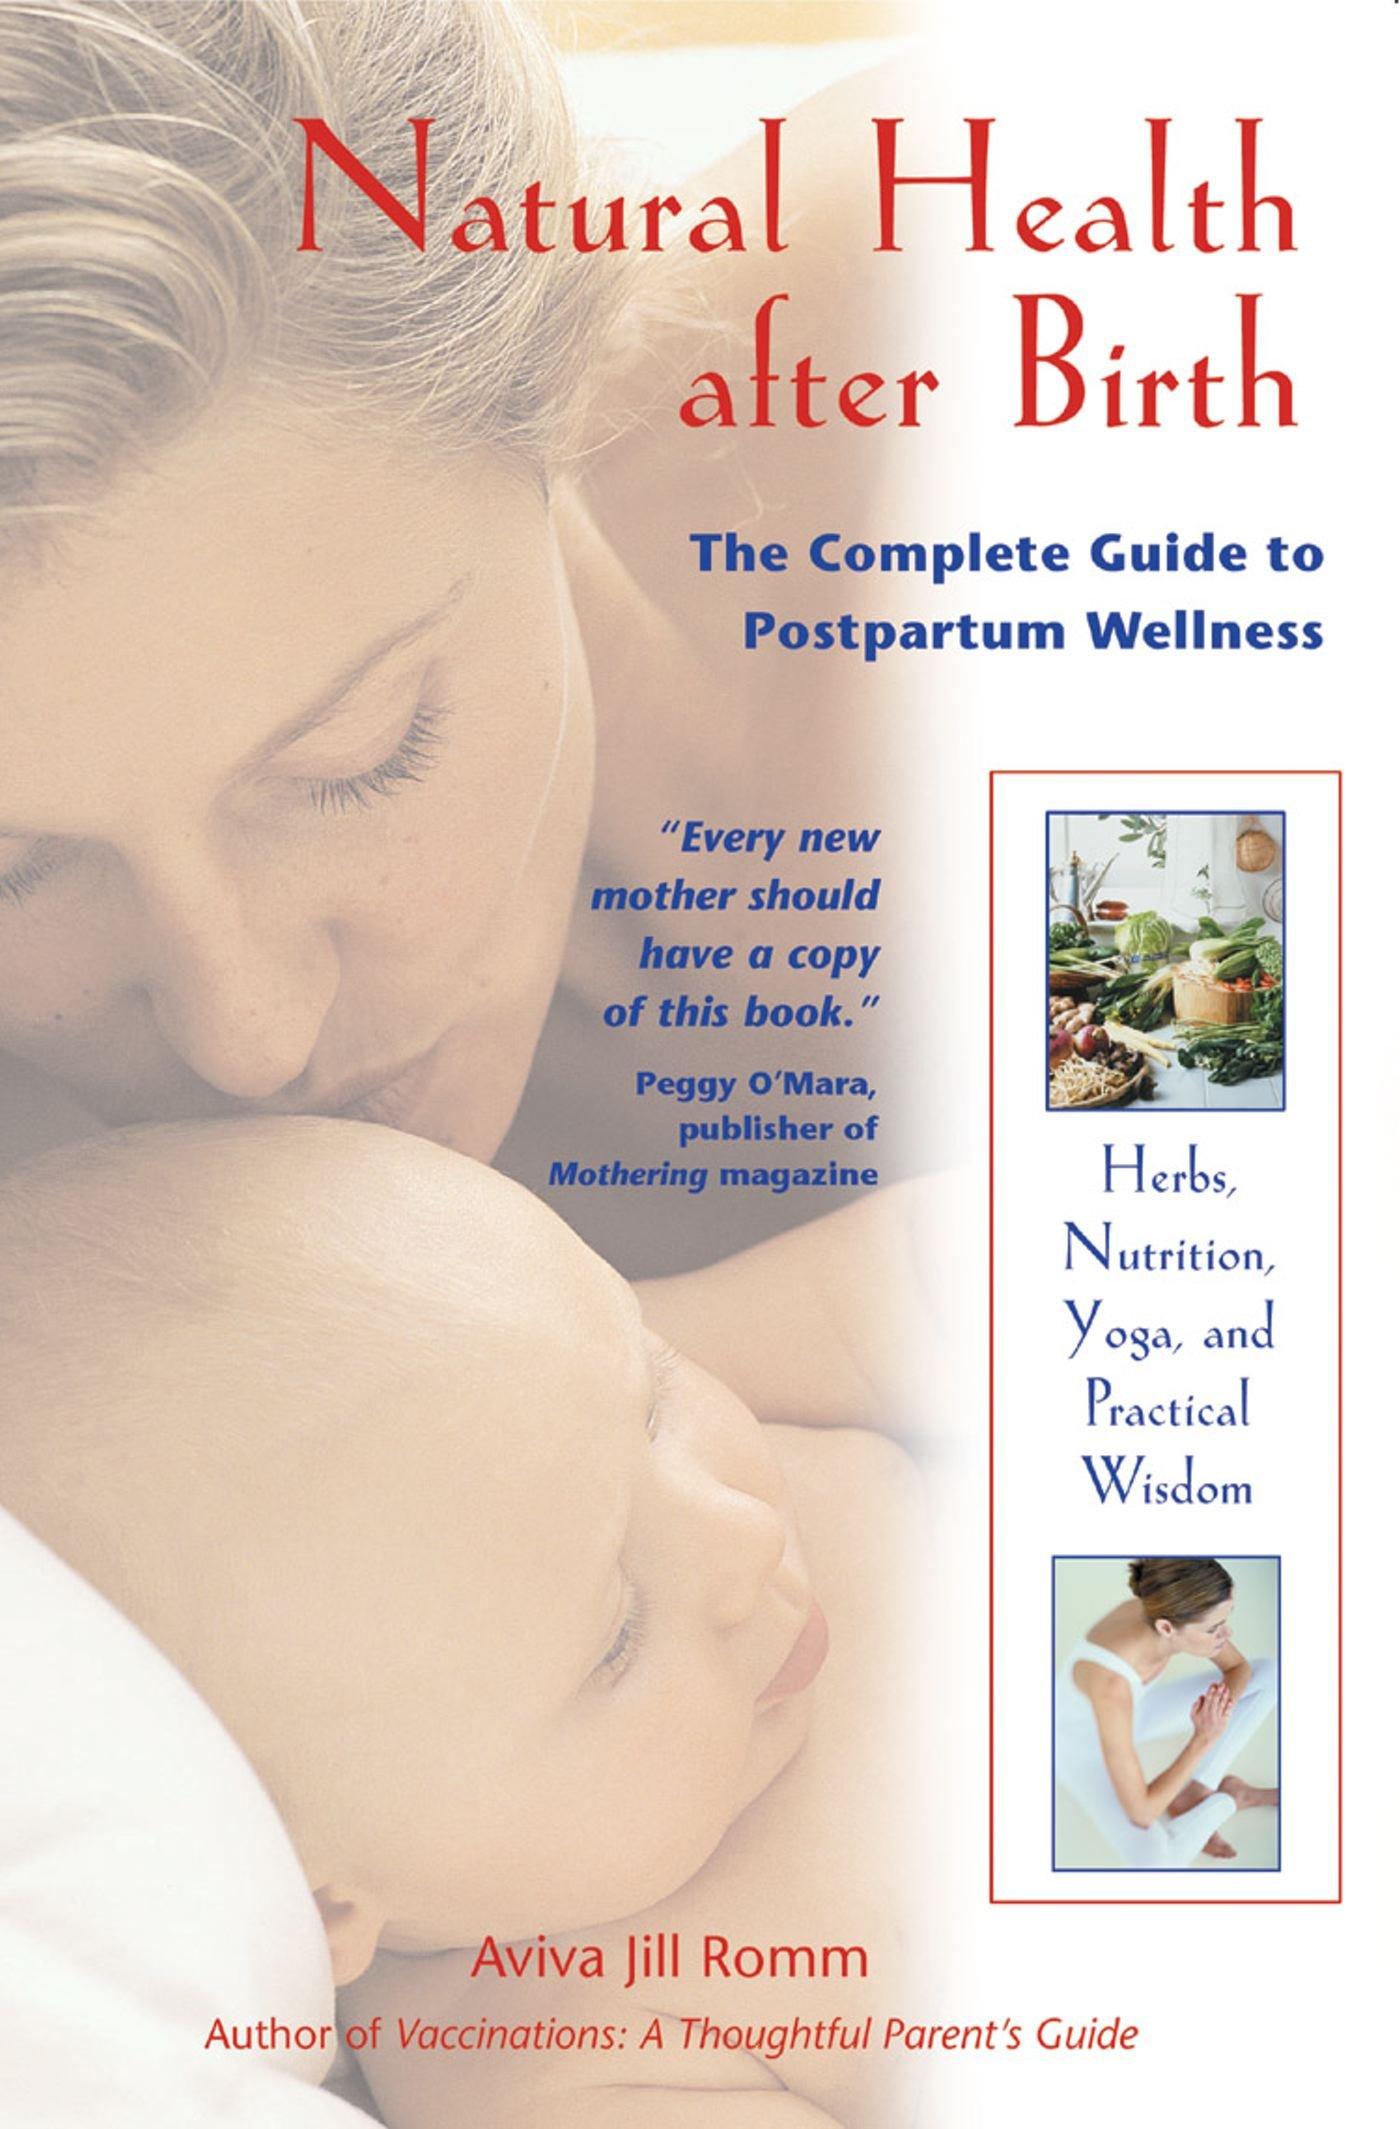 Natural Health after Birth Postpartum